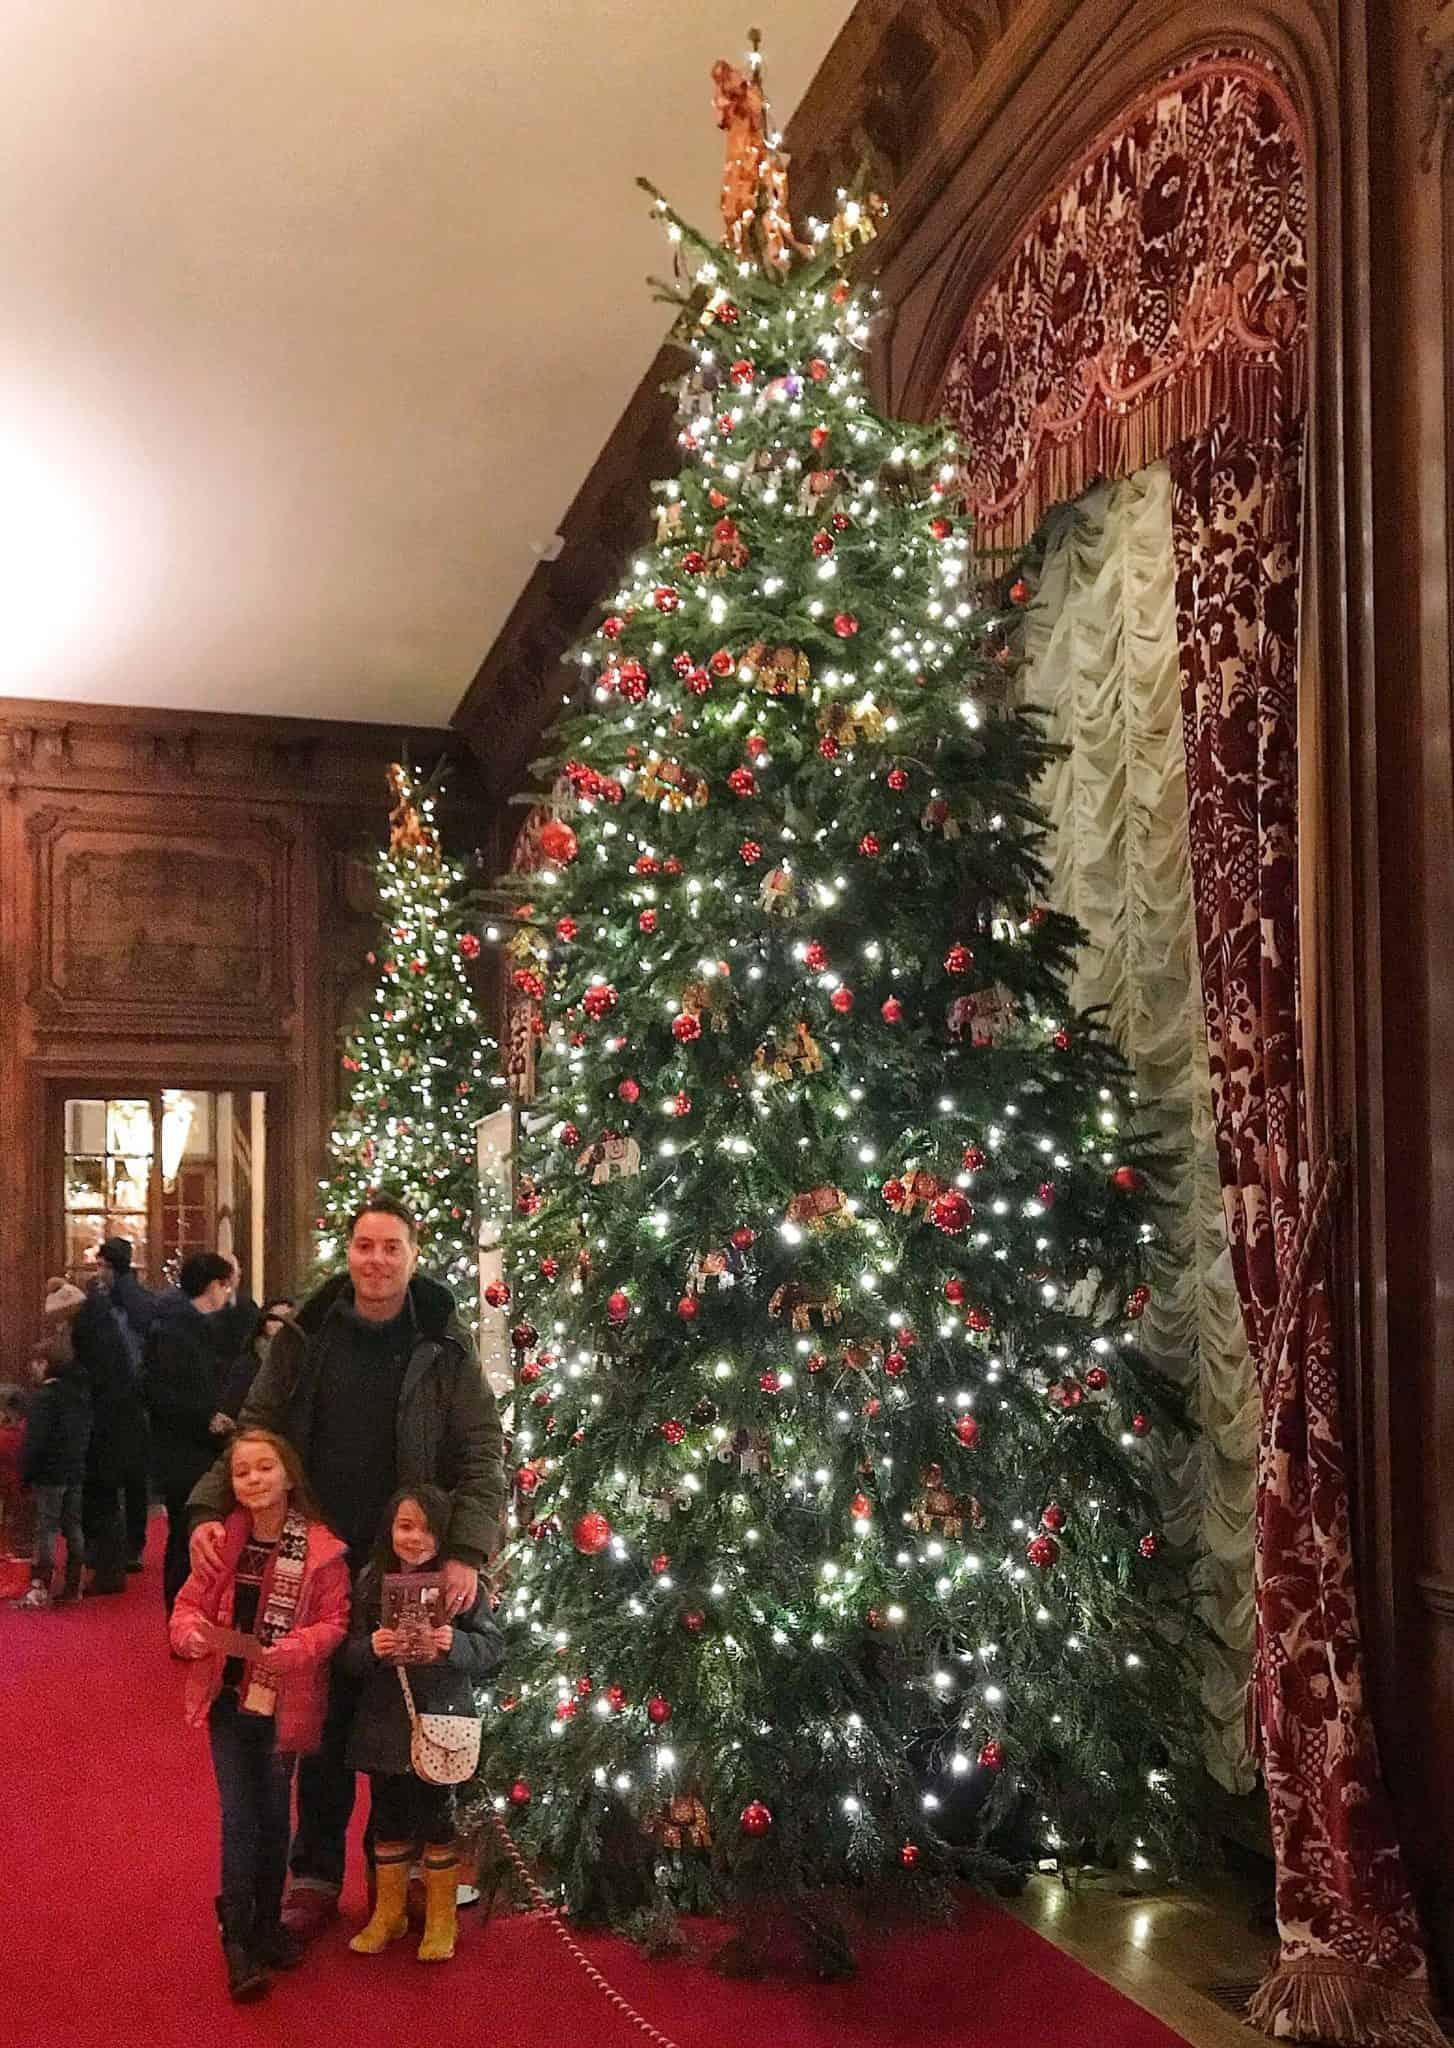 Giant Christmas Tree at Waddesdon Manor at Christmas